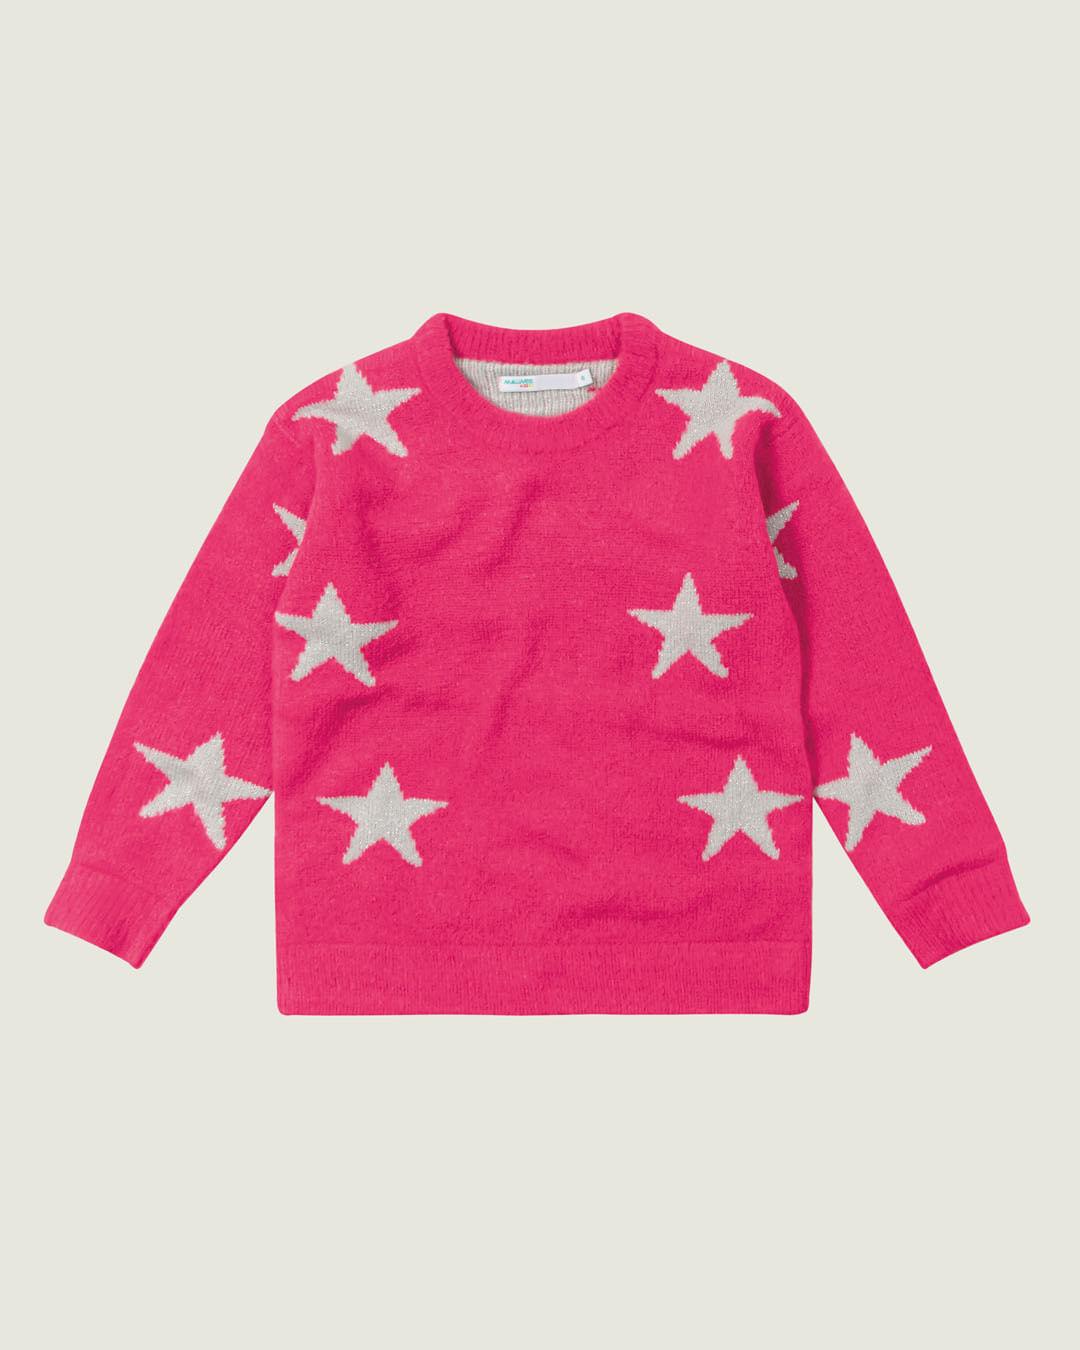 Blusão - Malwee Kids - Estrelas - Tricô - Rosa Escuro - Menina